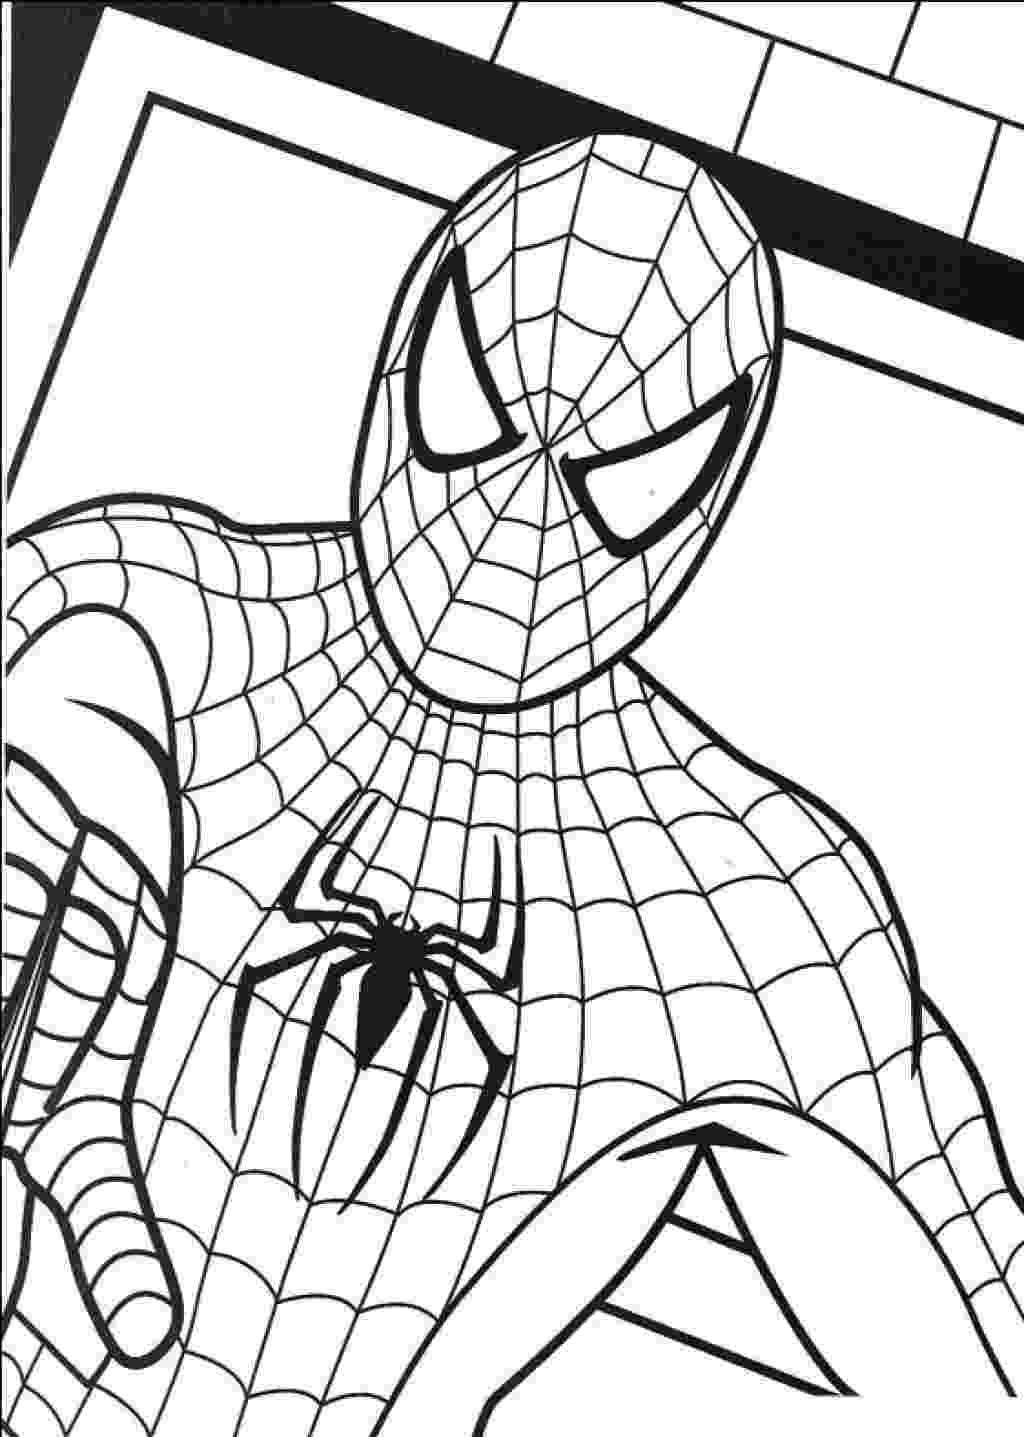 spider man coloring sheet spiderman coloring pages coloring pages to print man spider coloring sheet